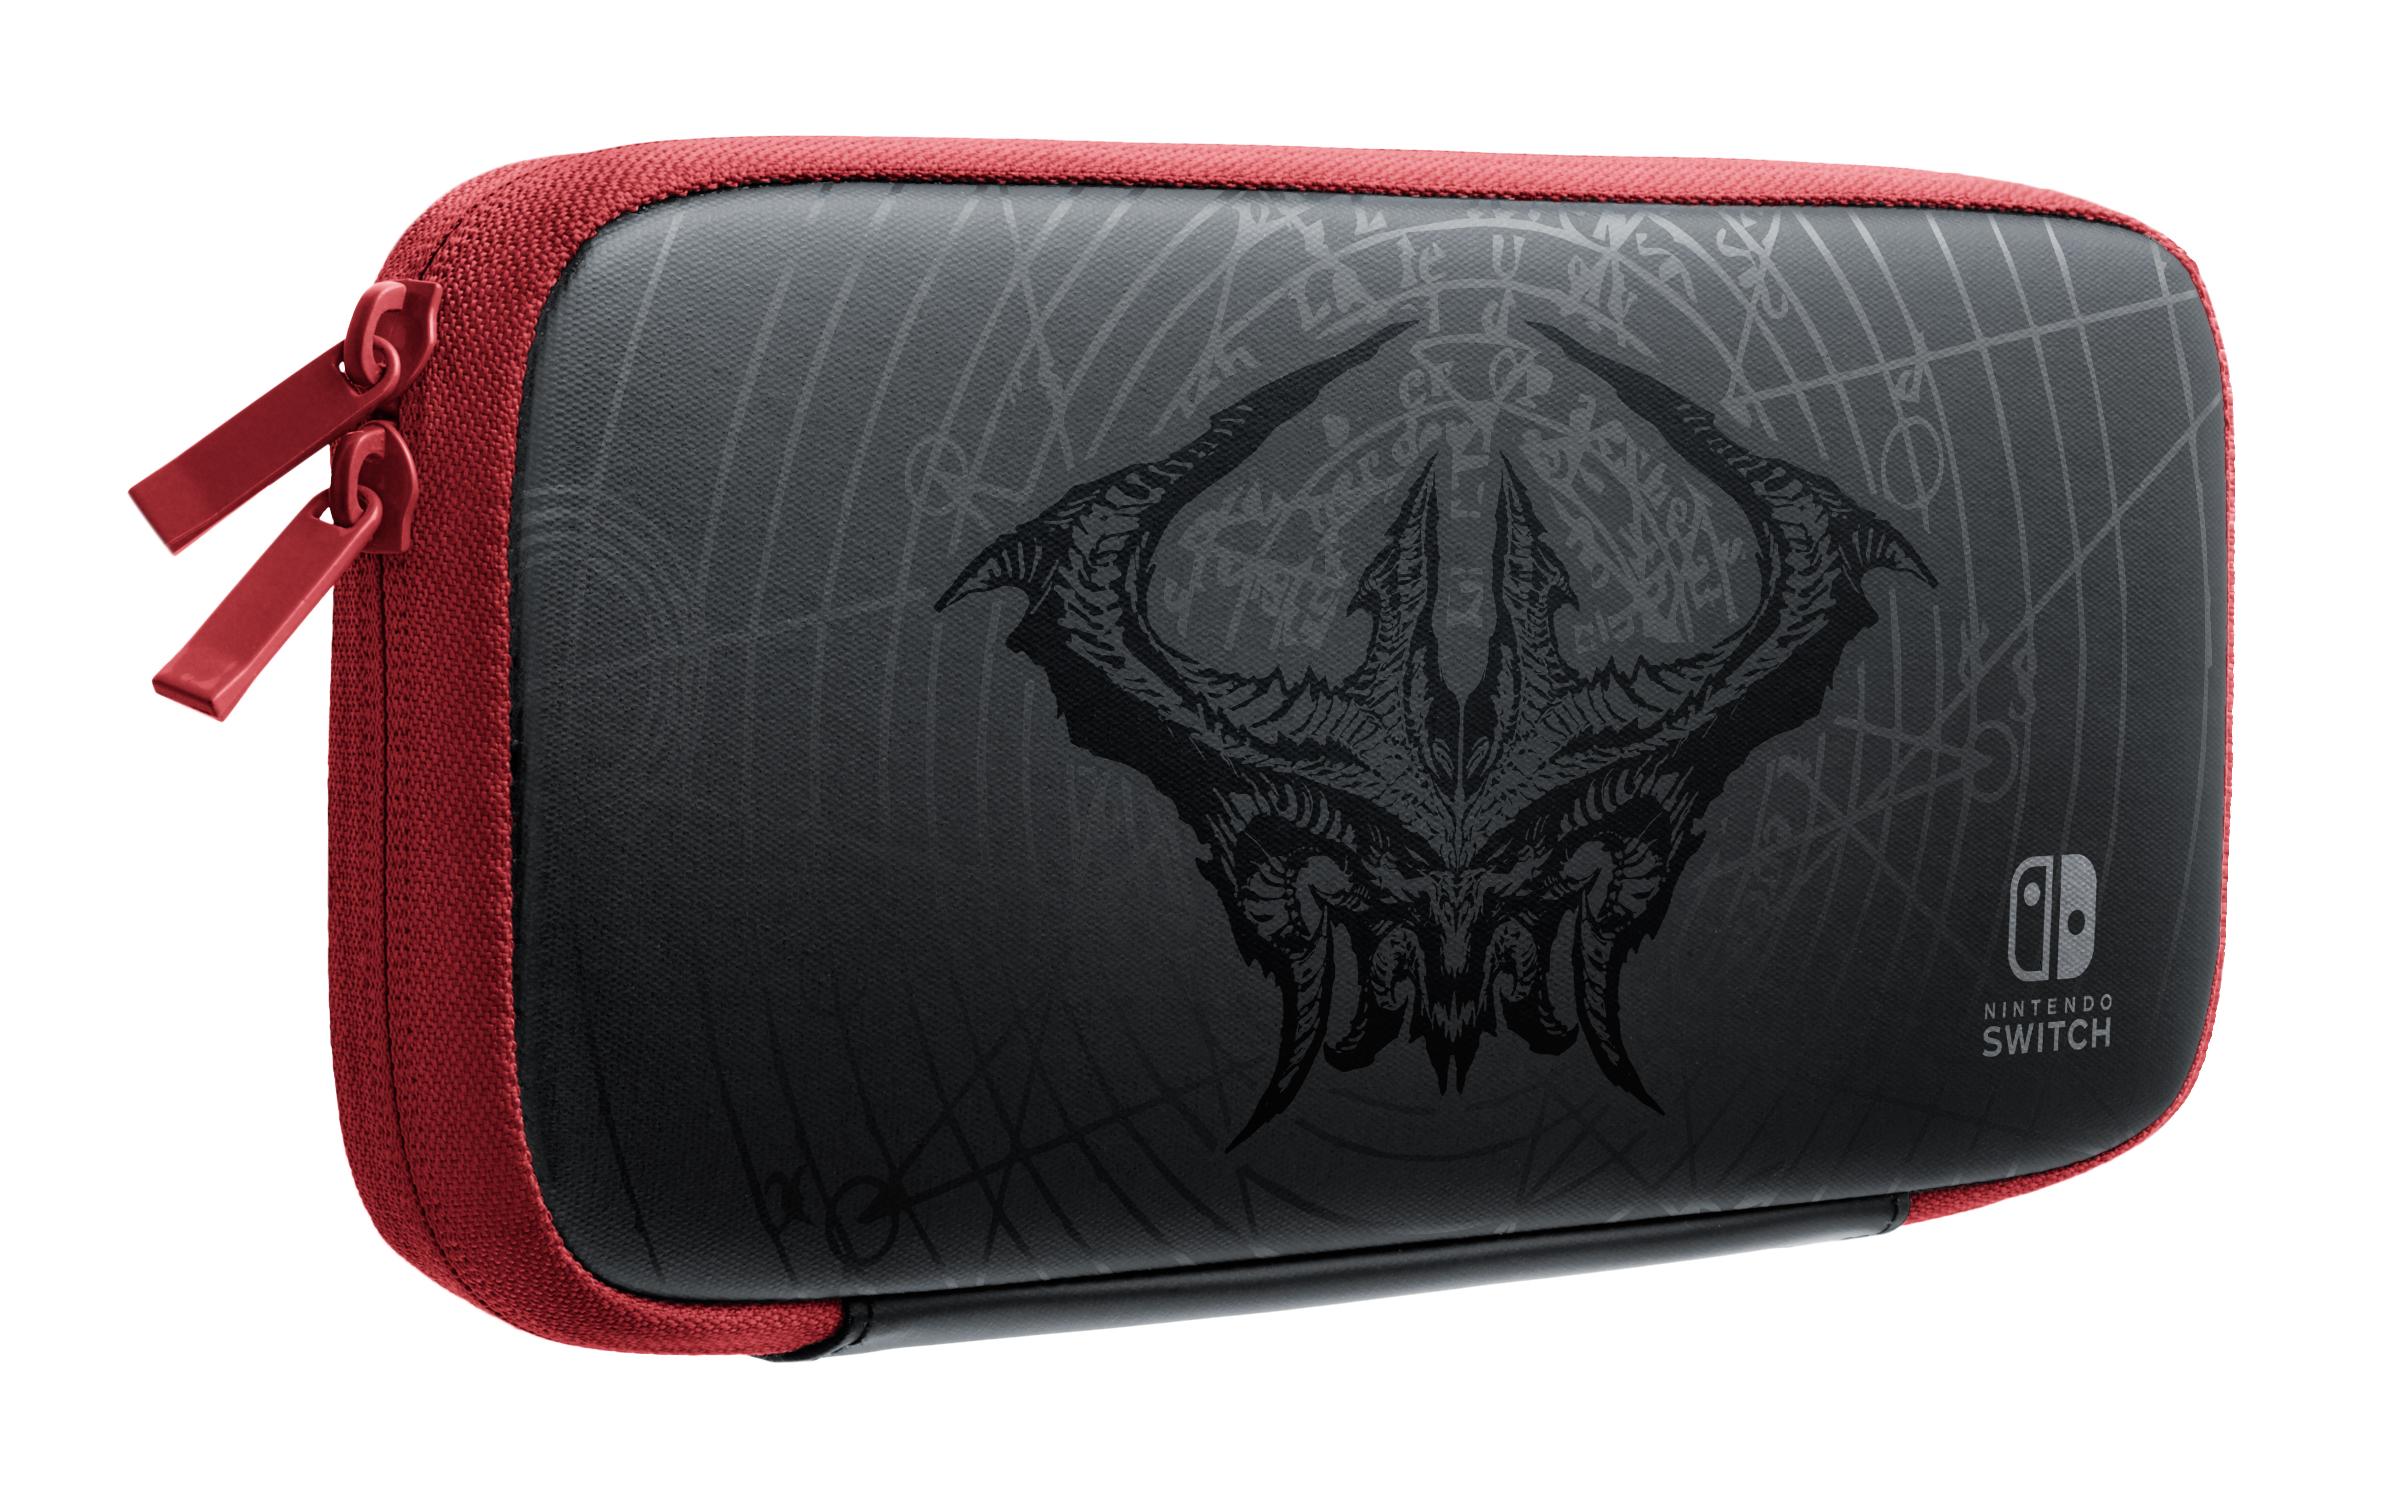 Nintendo Switch Presents its Special Edition of Diablo 3